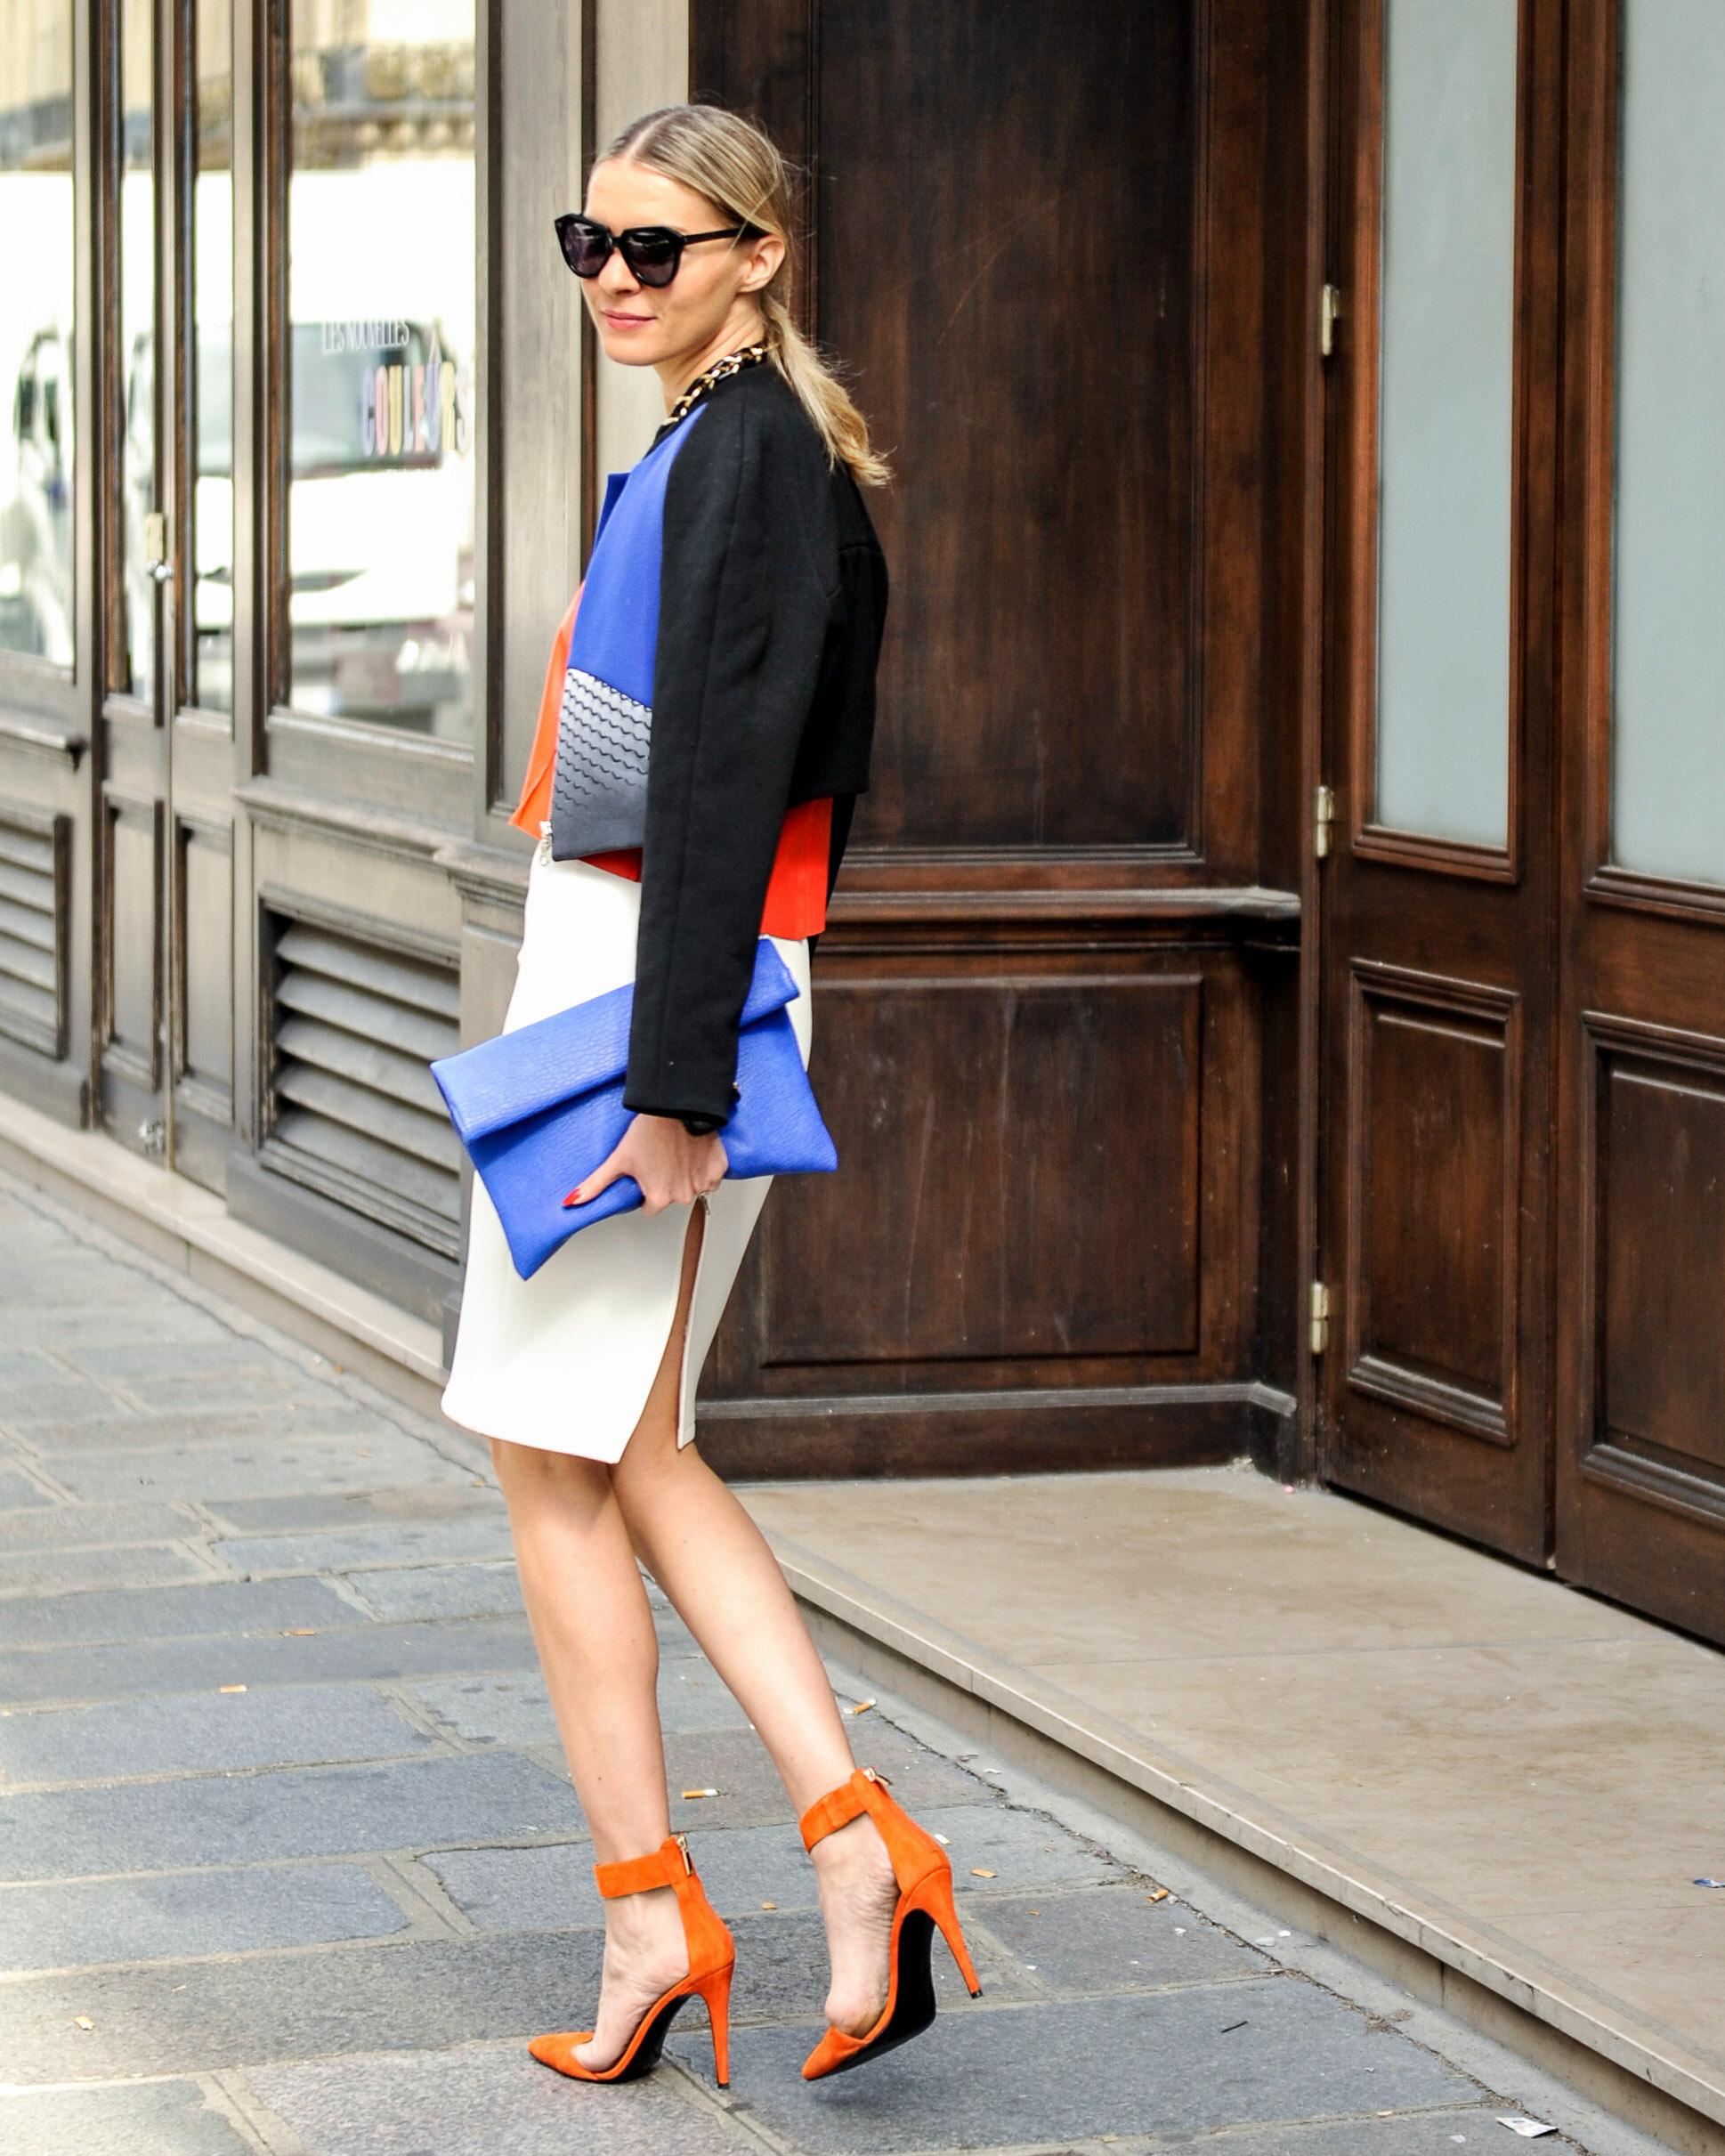 StreetStyle_ParisFashionWeek_LeandroJusten_057.jpg